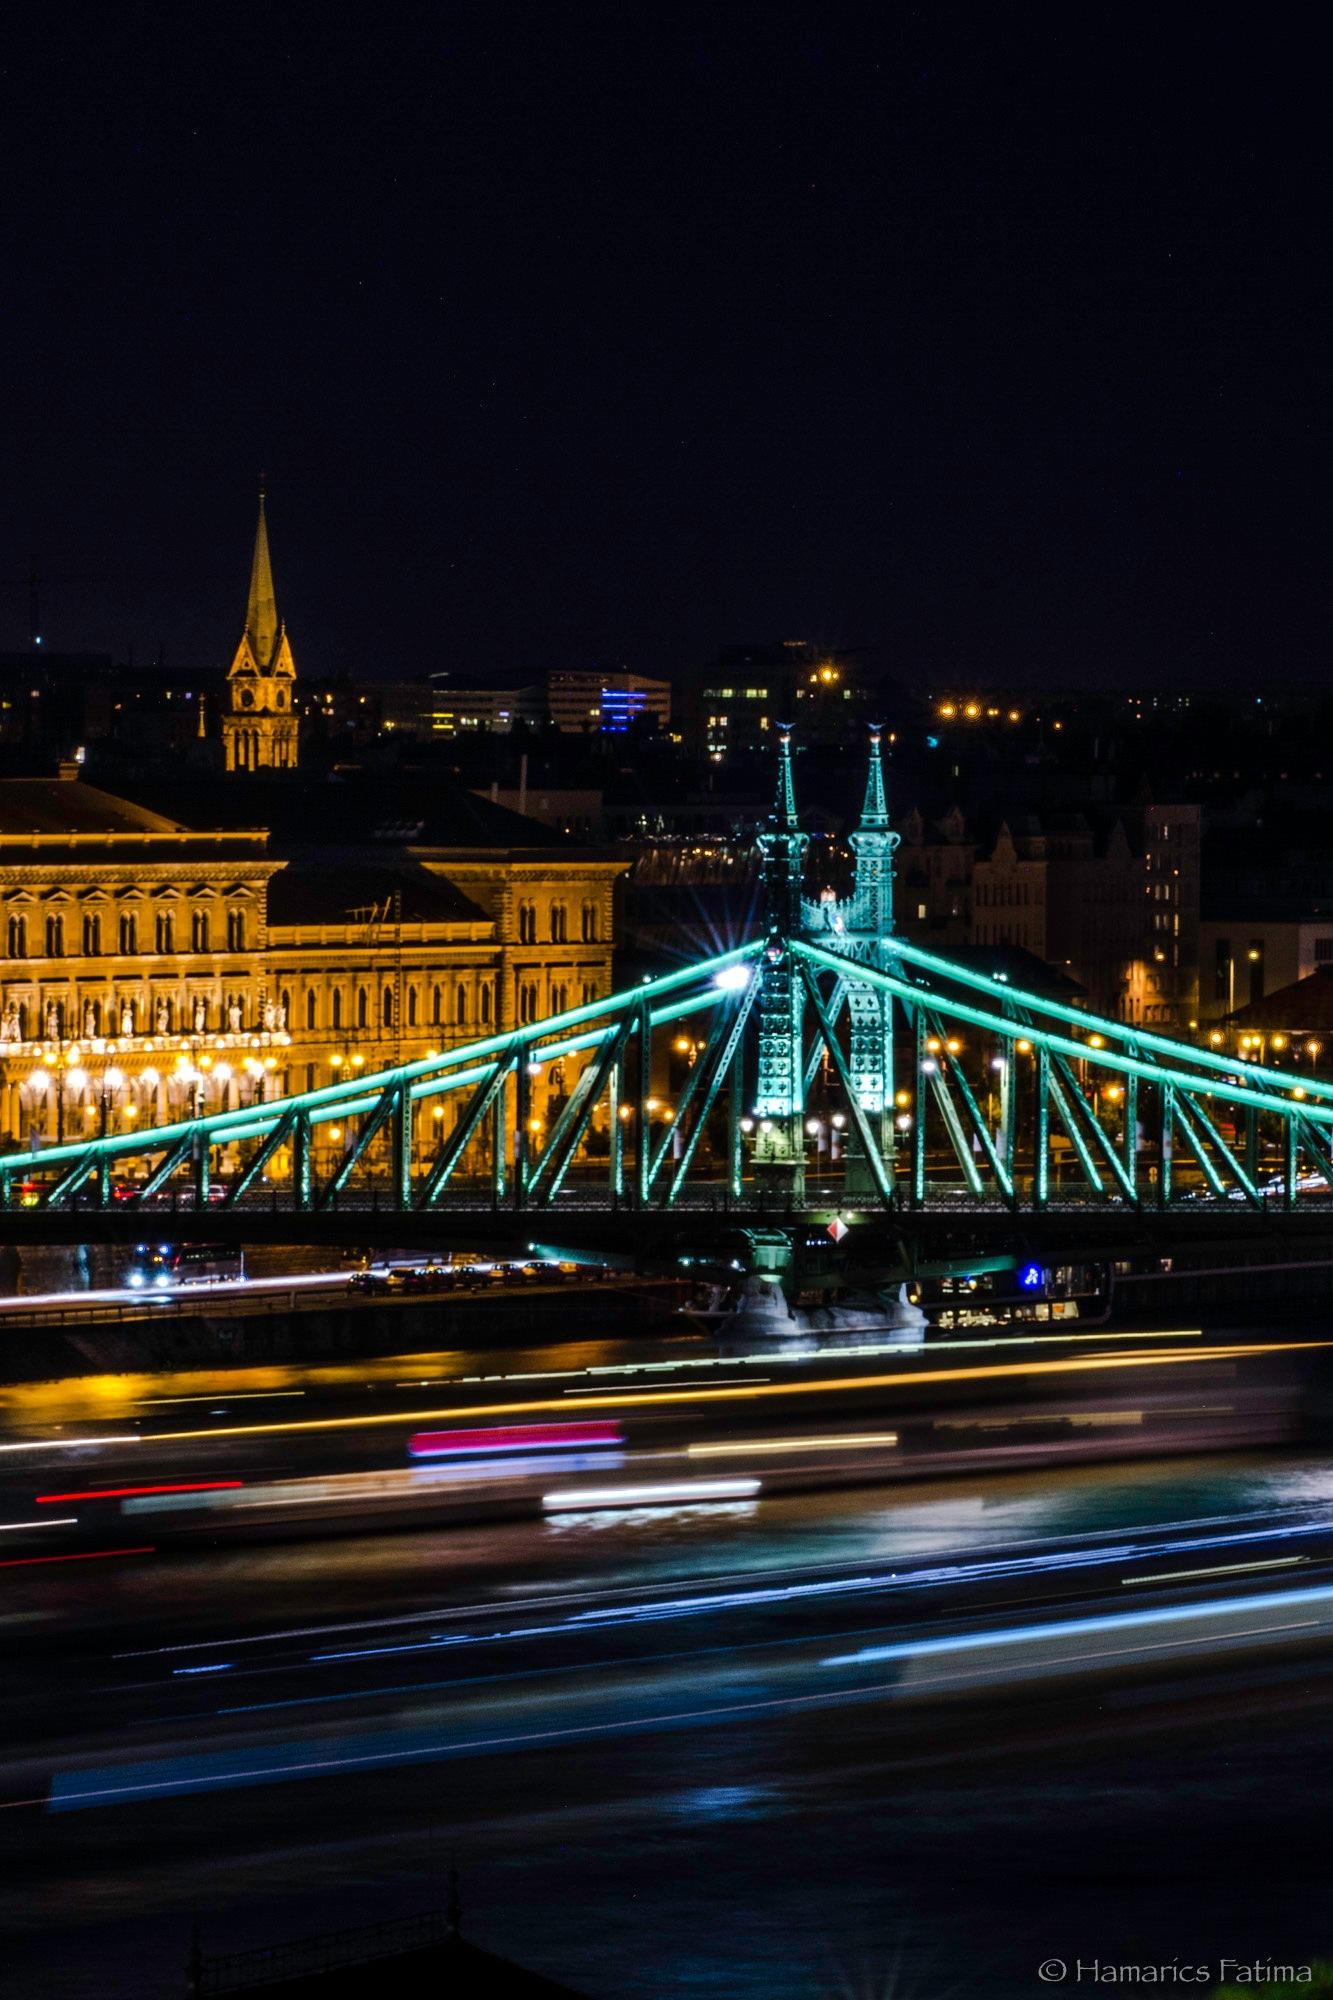 Traffic under the bridge by Fatima Hamarics